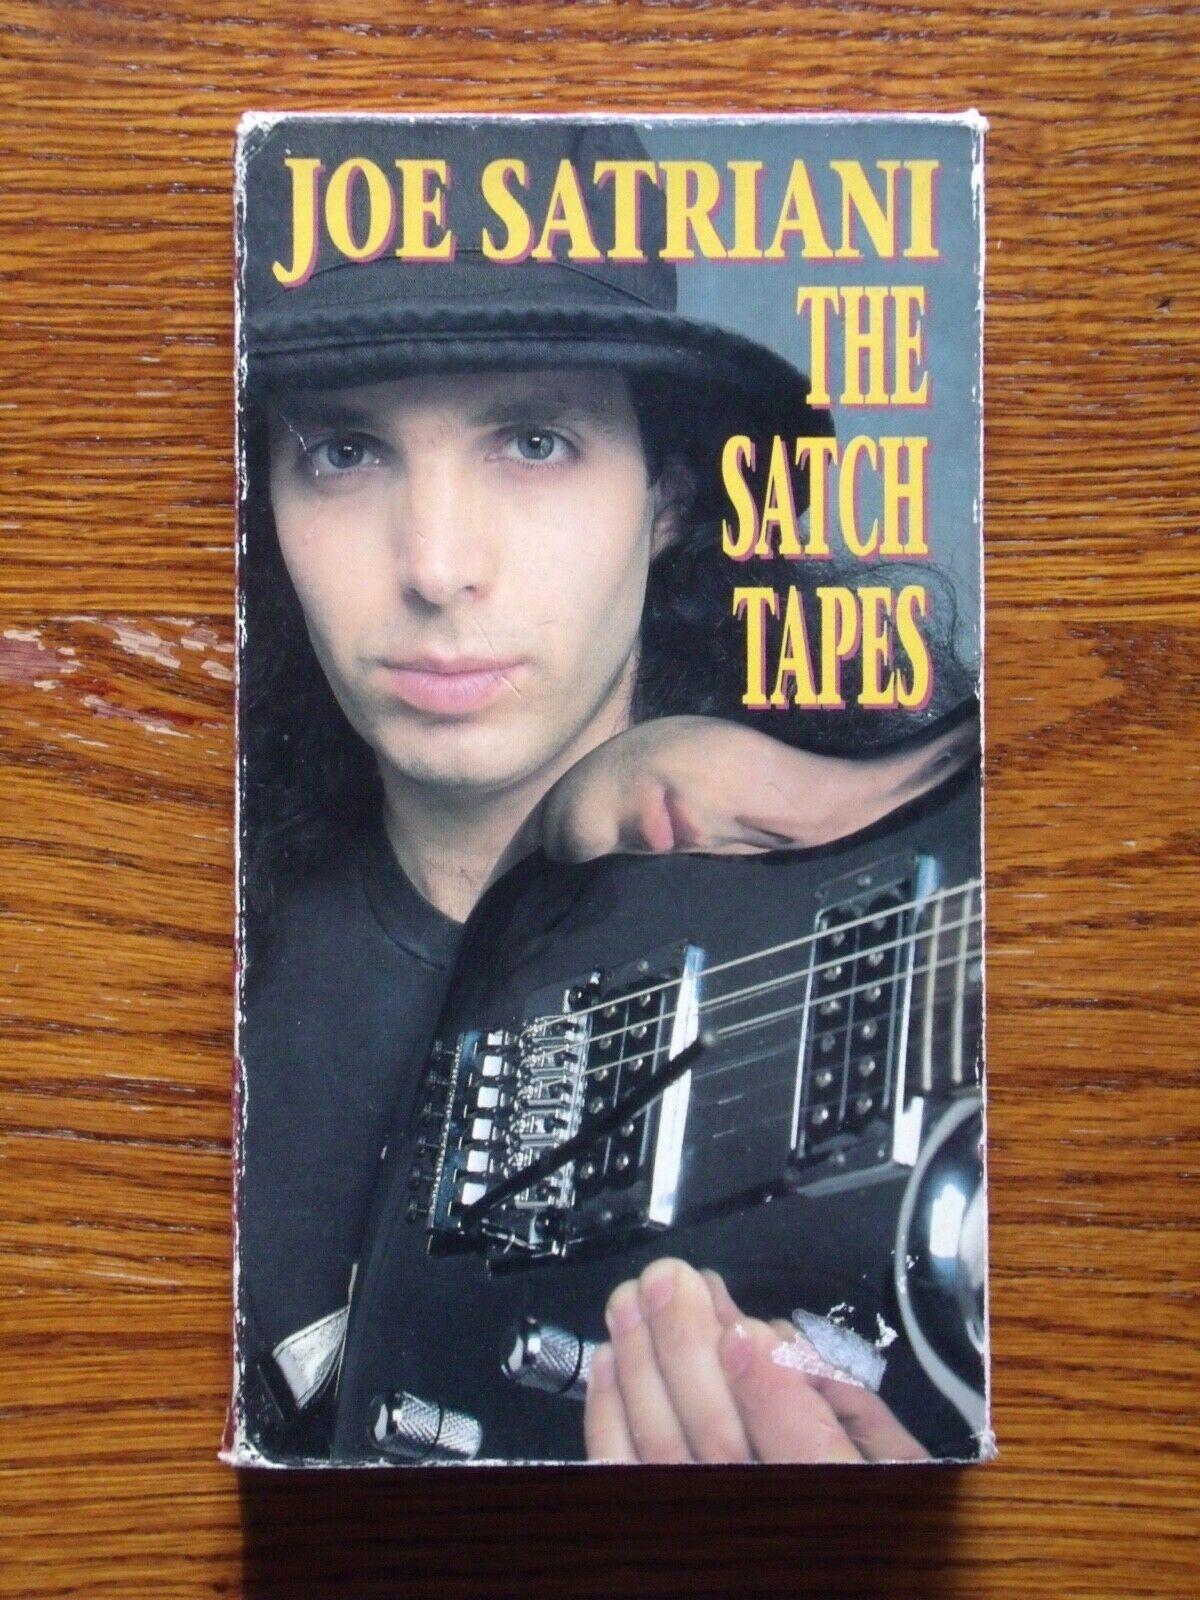 Joe Satriani The Satch Tapes VHS - $0.99